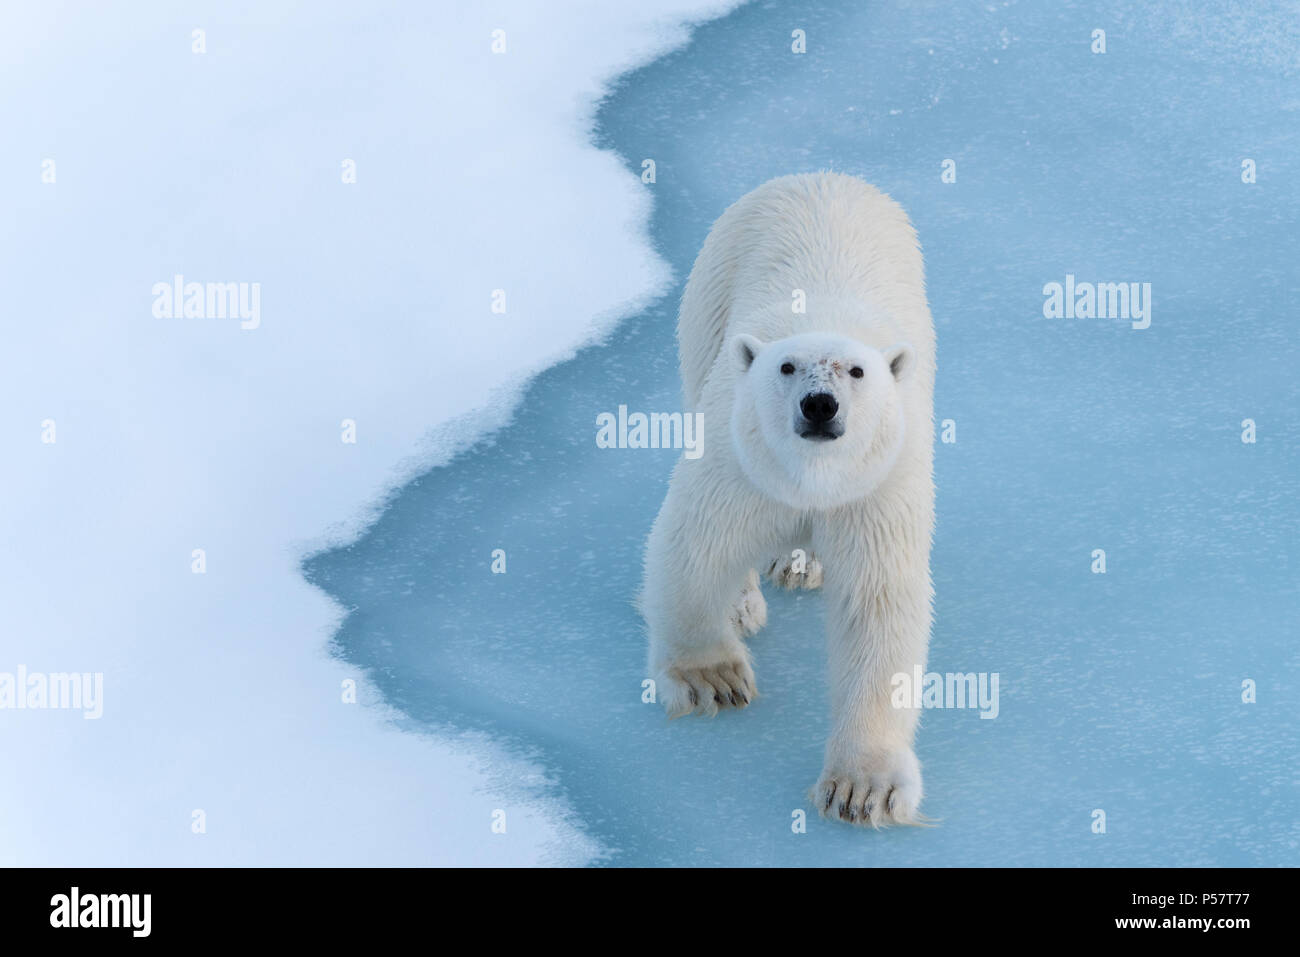 Close up Polar Bear full frontal to camera - Stock Image